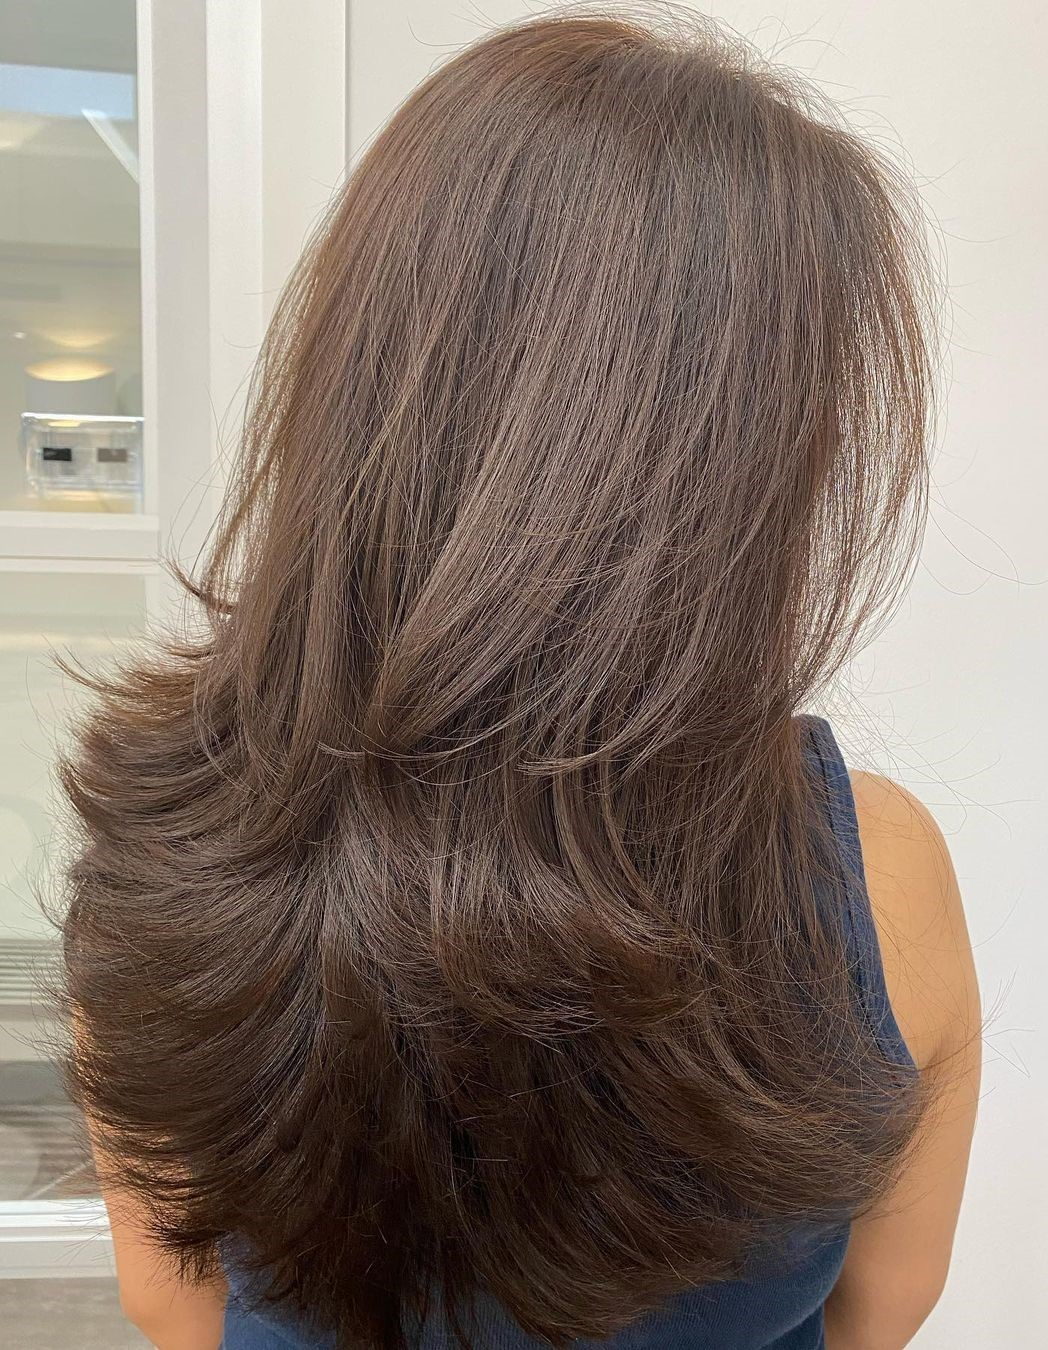 Wispy Long Haircut for Women